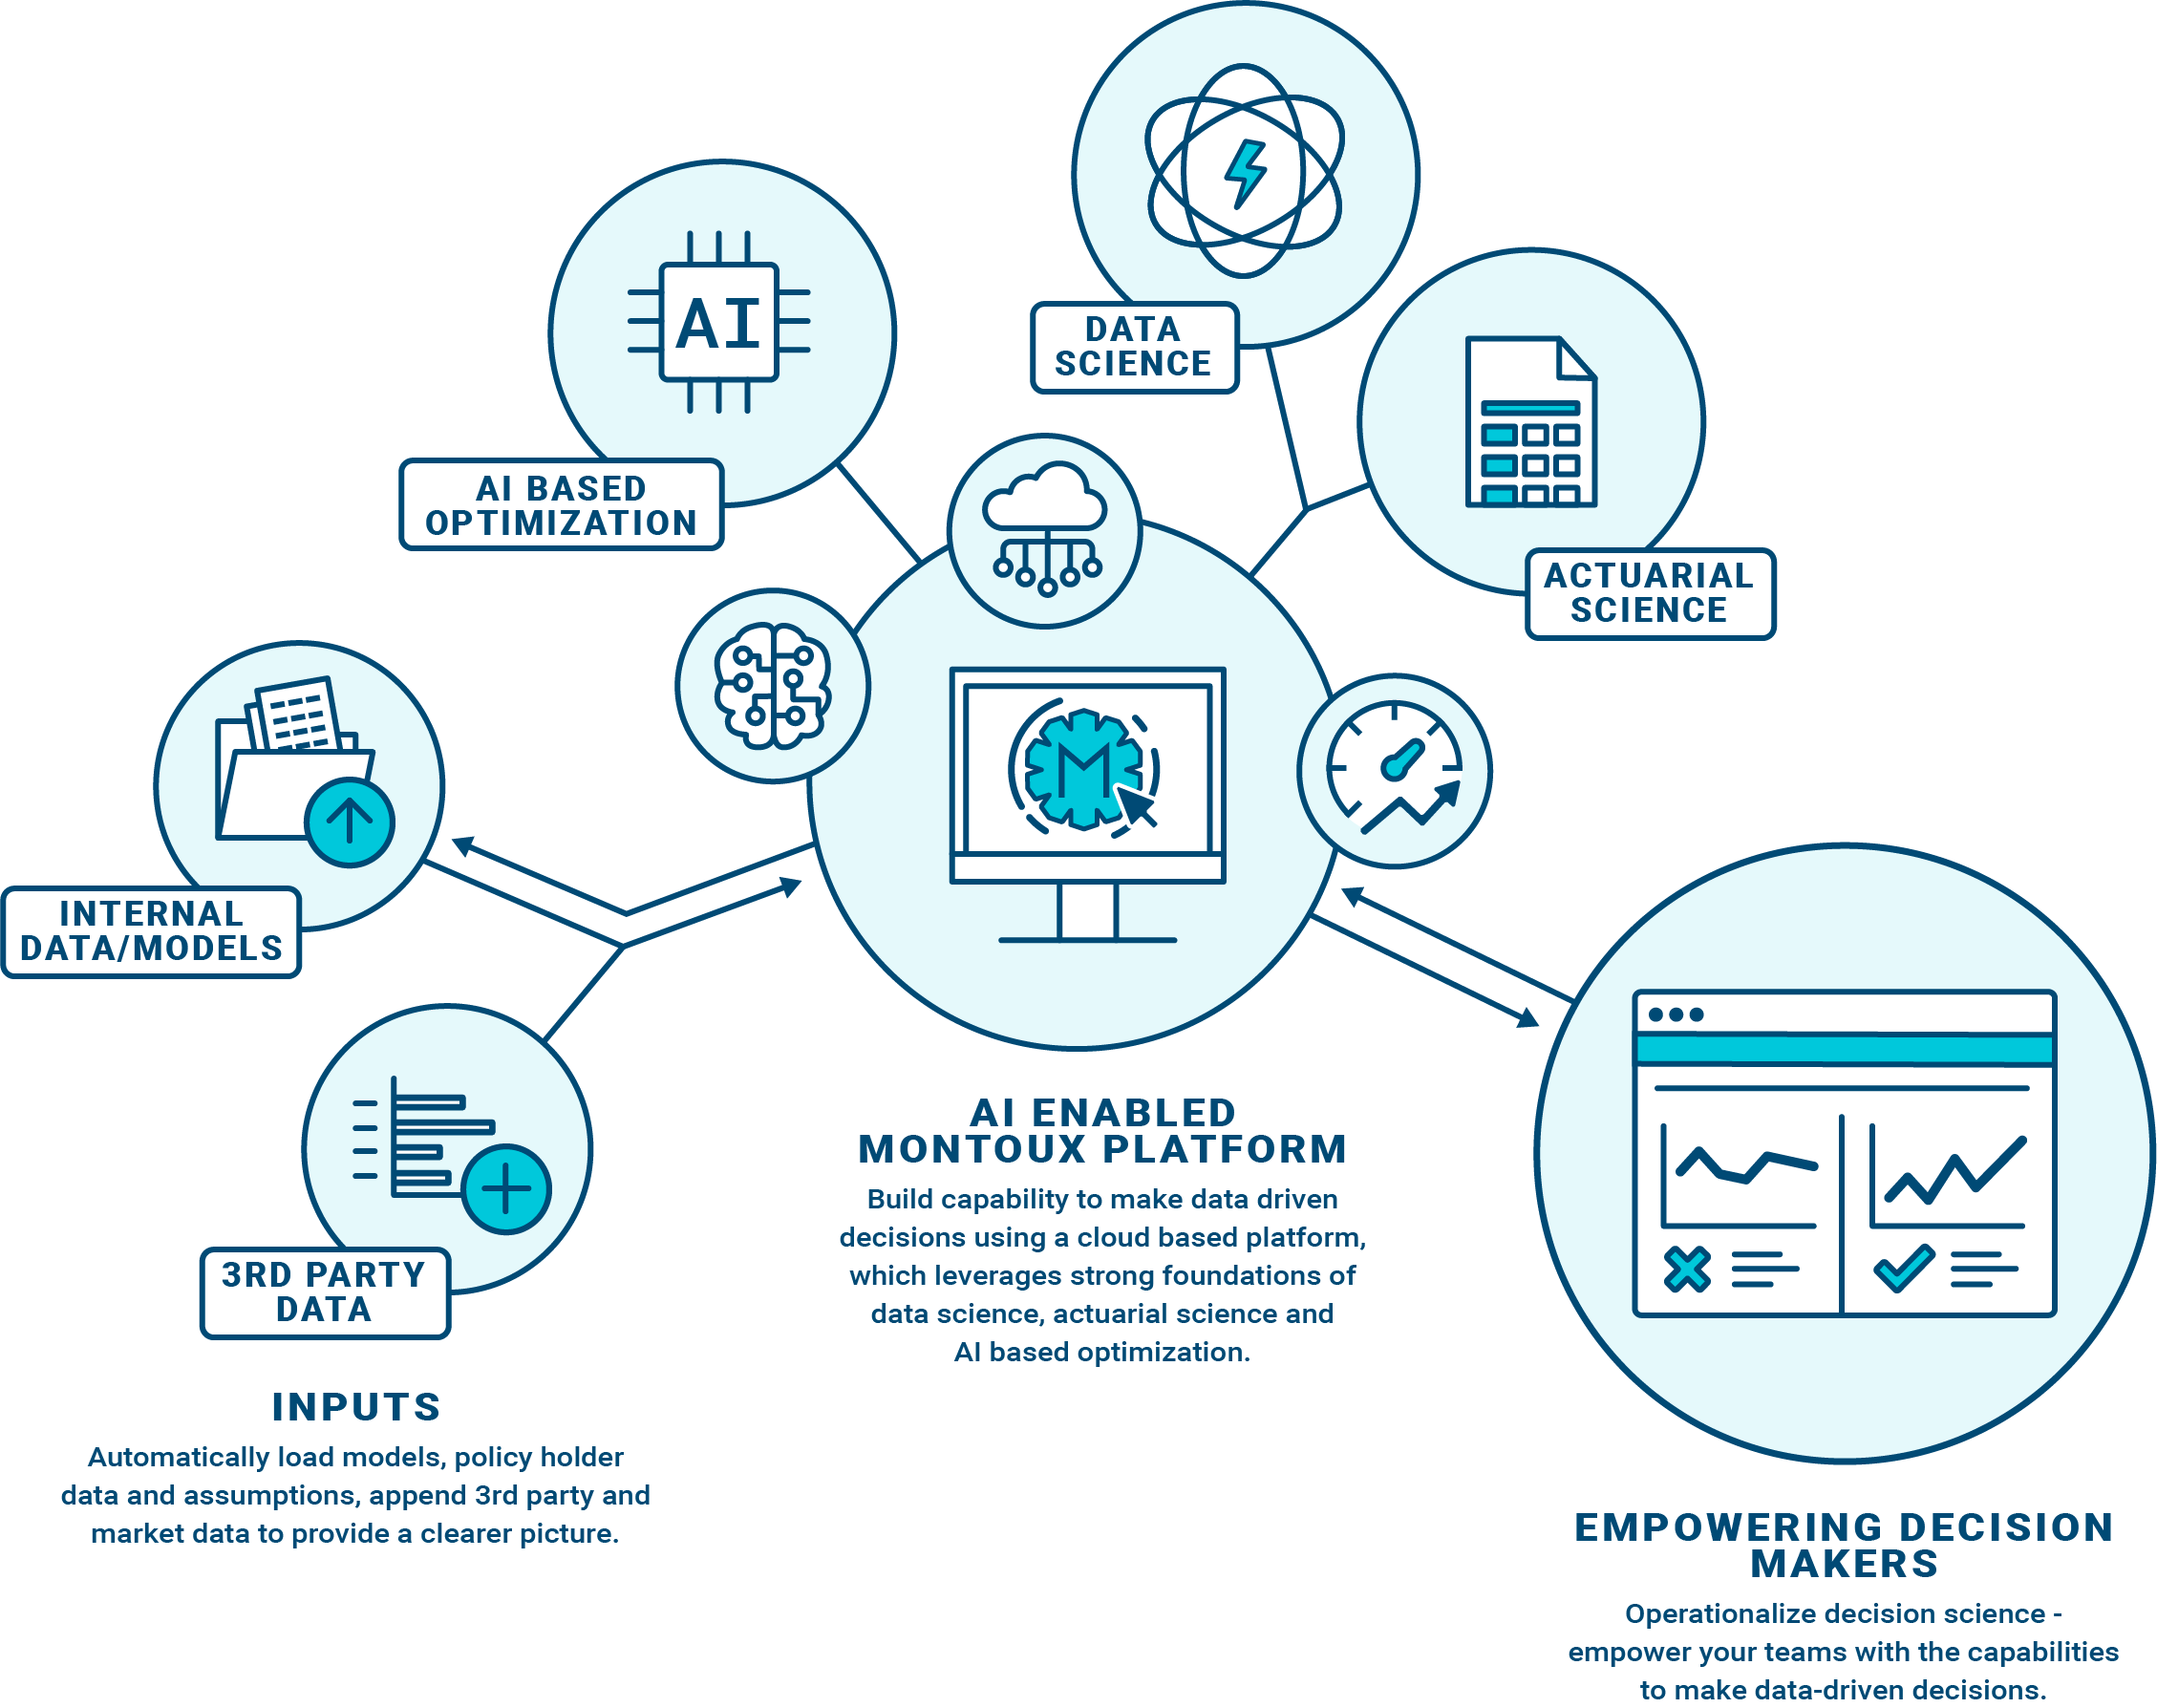 Montoux enables optimized, data-driven decision making capability